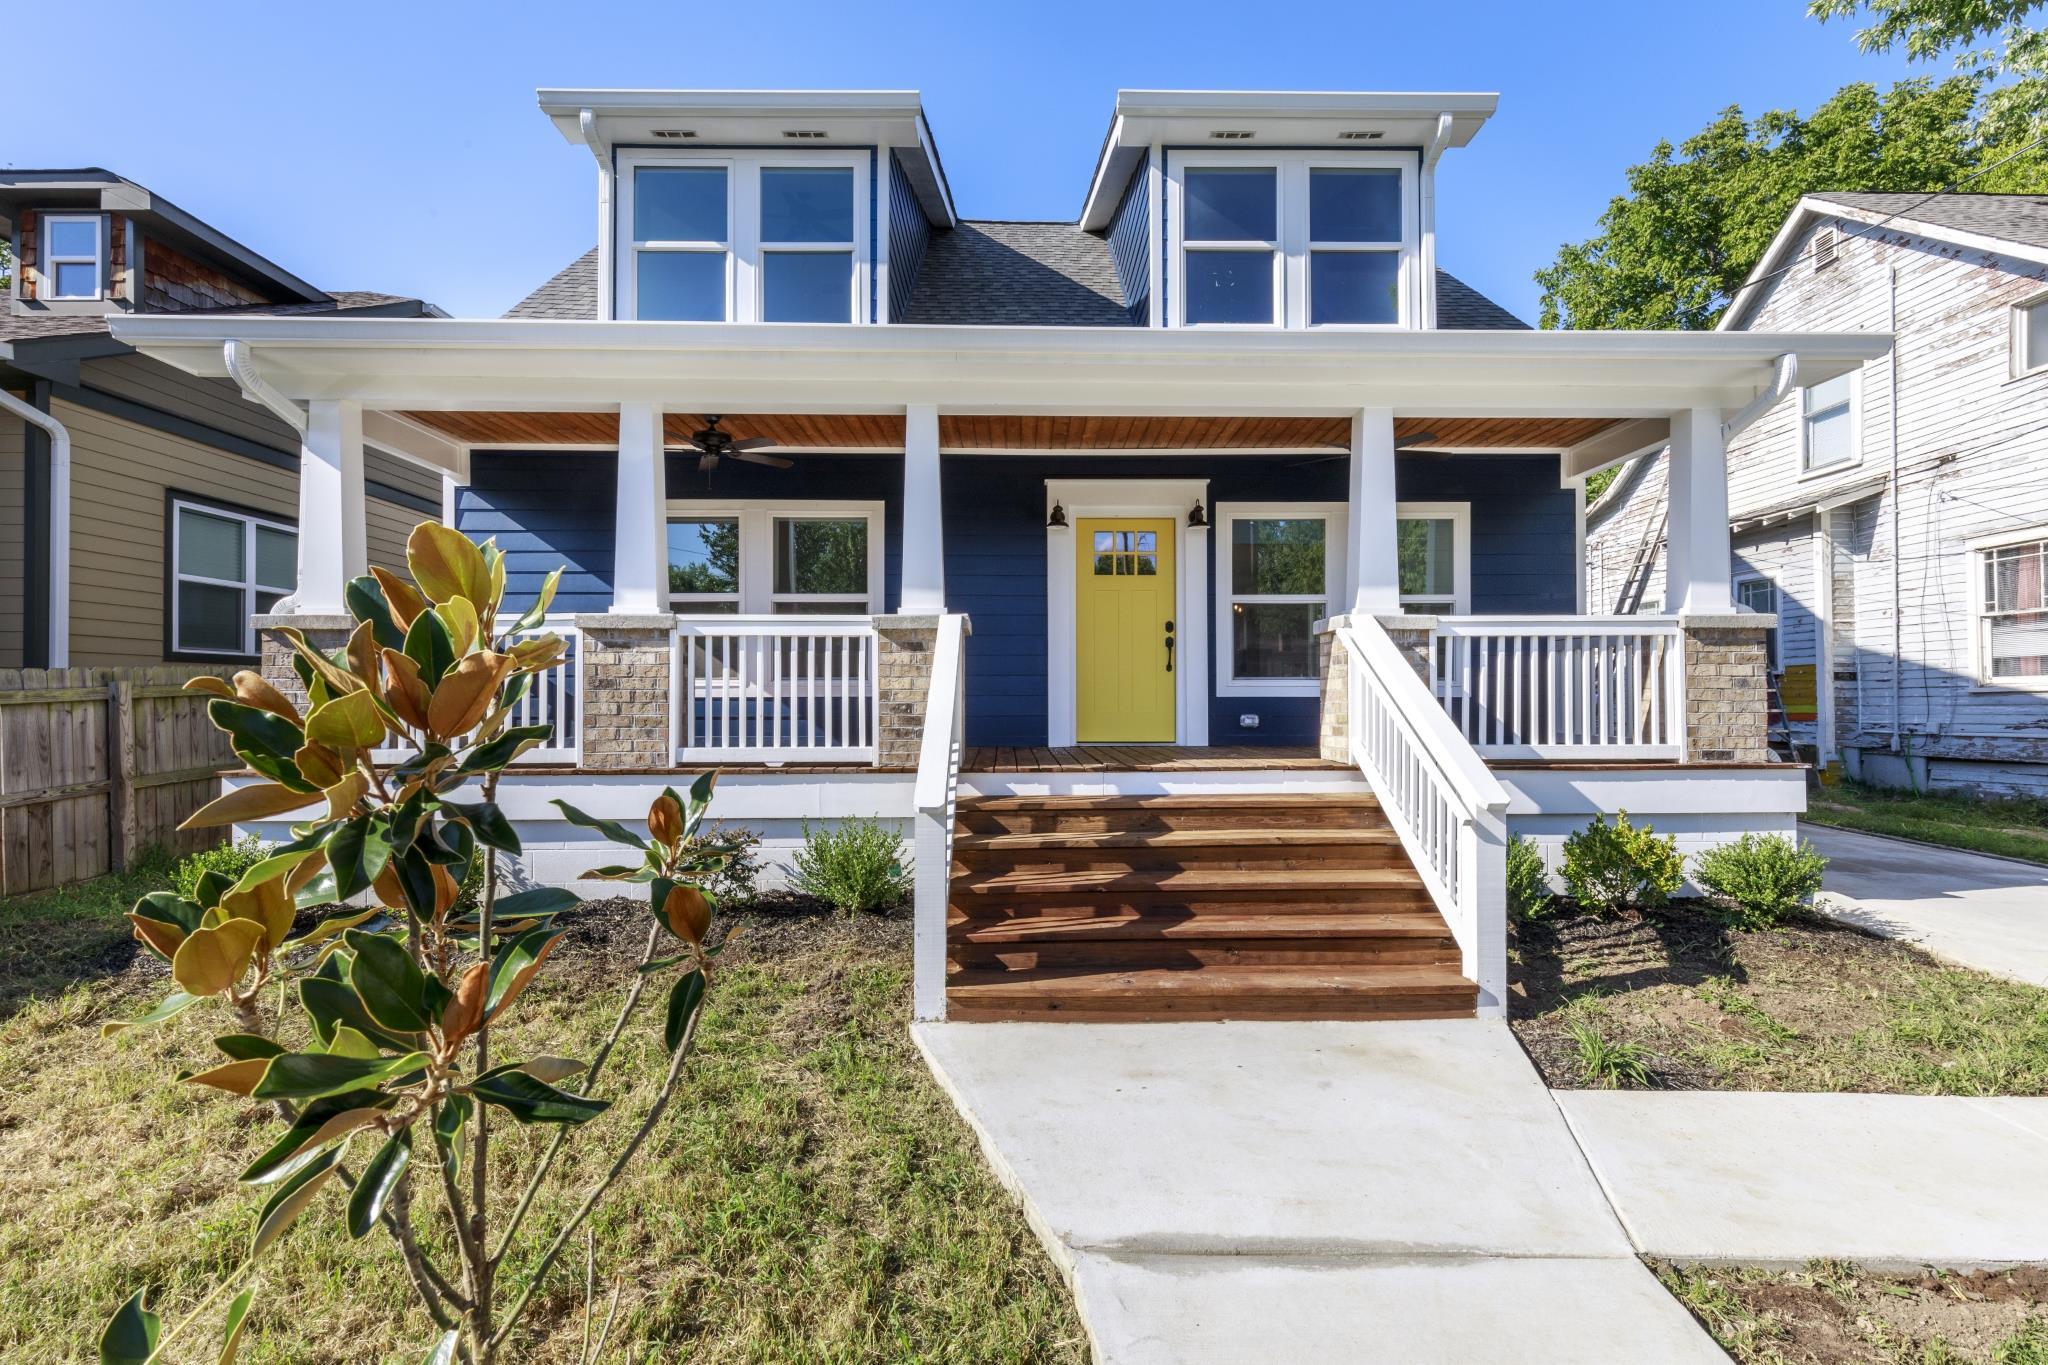 1011 Sharpe Ave, Nashville, TN 37206 - Nashville, TN real estate listing